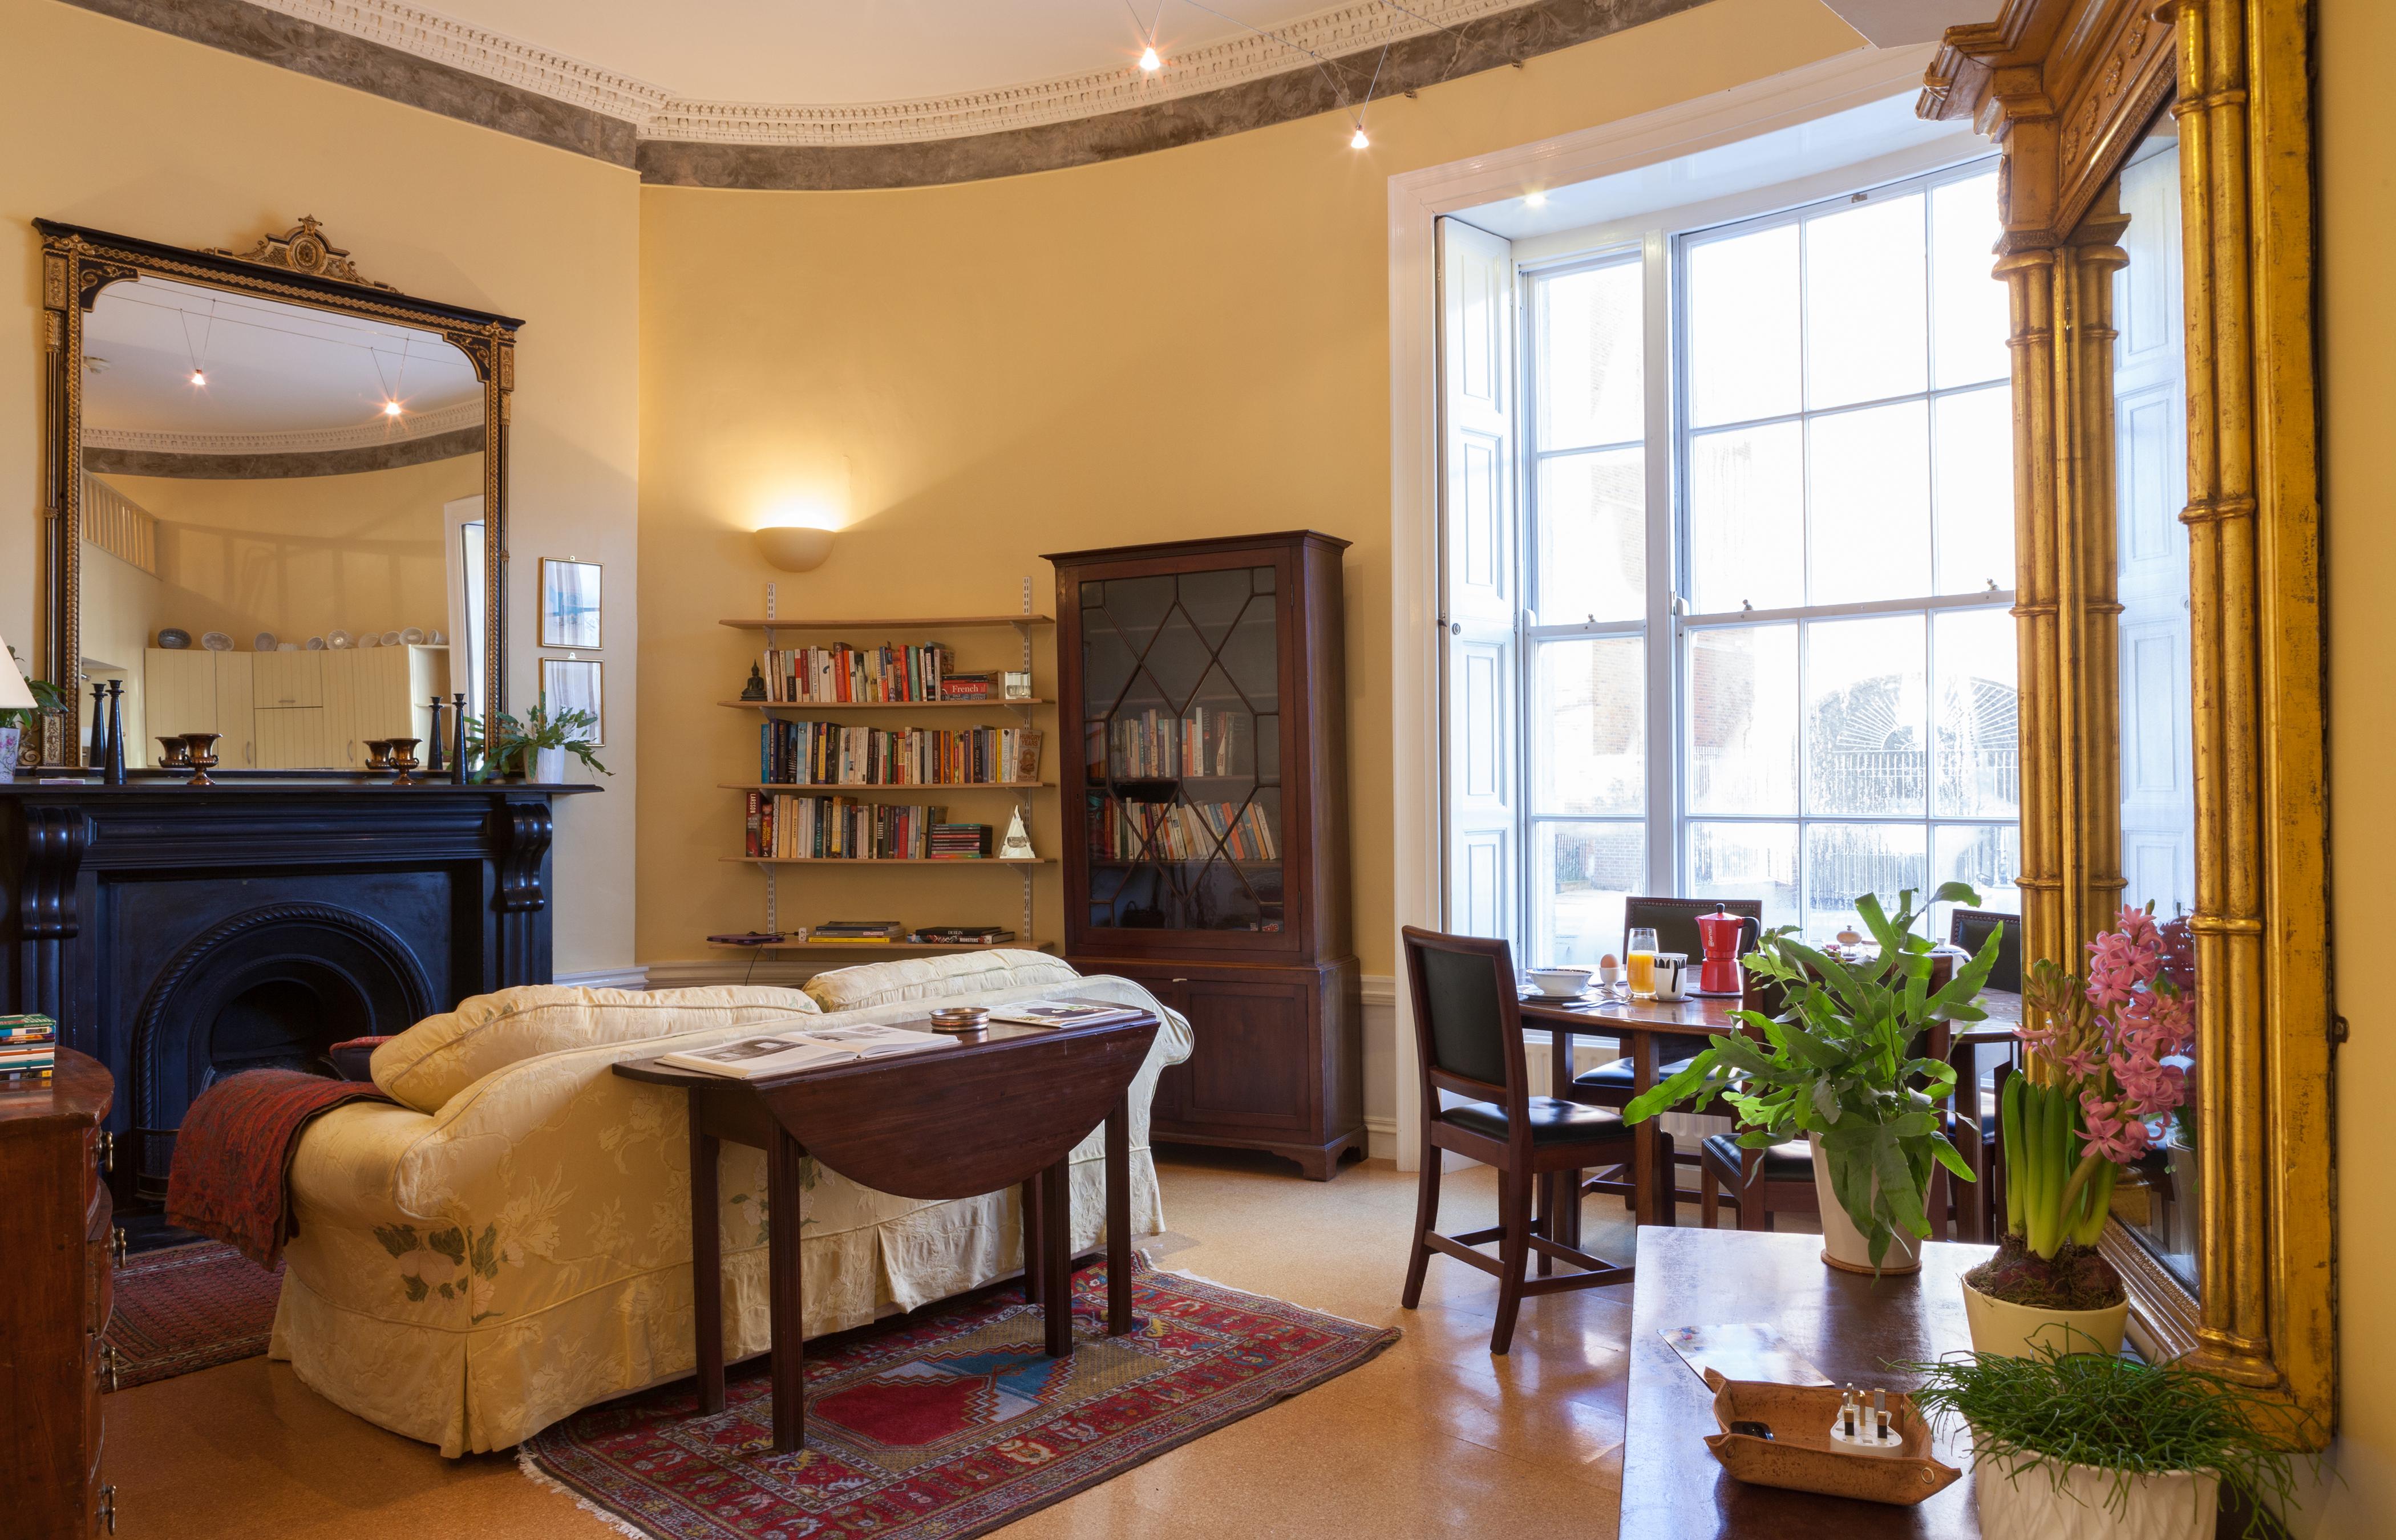 Airbnb   Marino, Dublin - County Dublin, Ireland - Airbnb